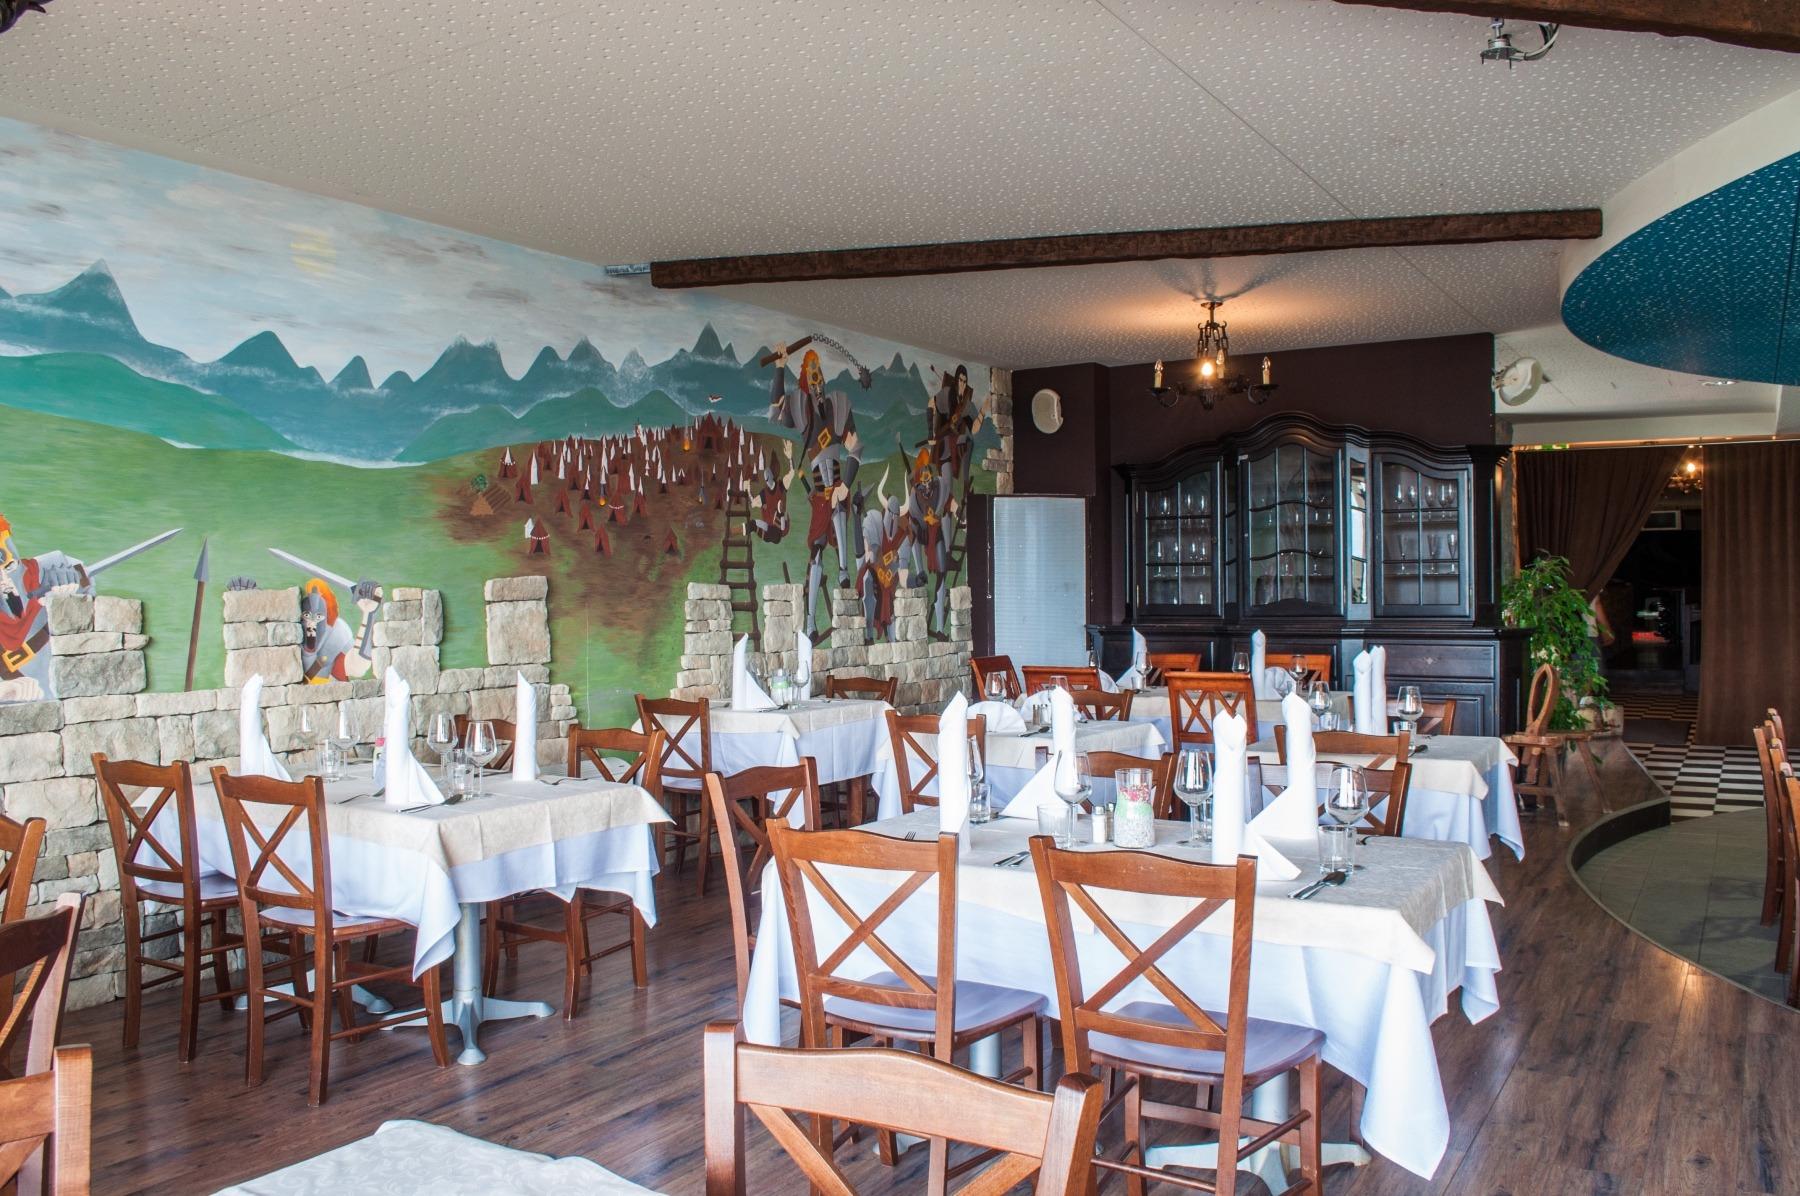 Restoran - Hotel EPIC - Rajketing1